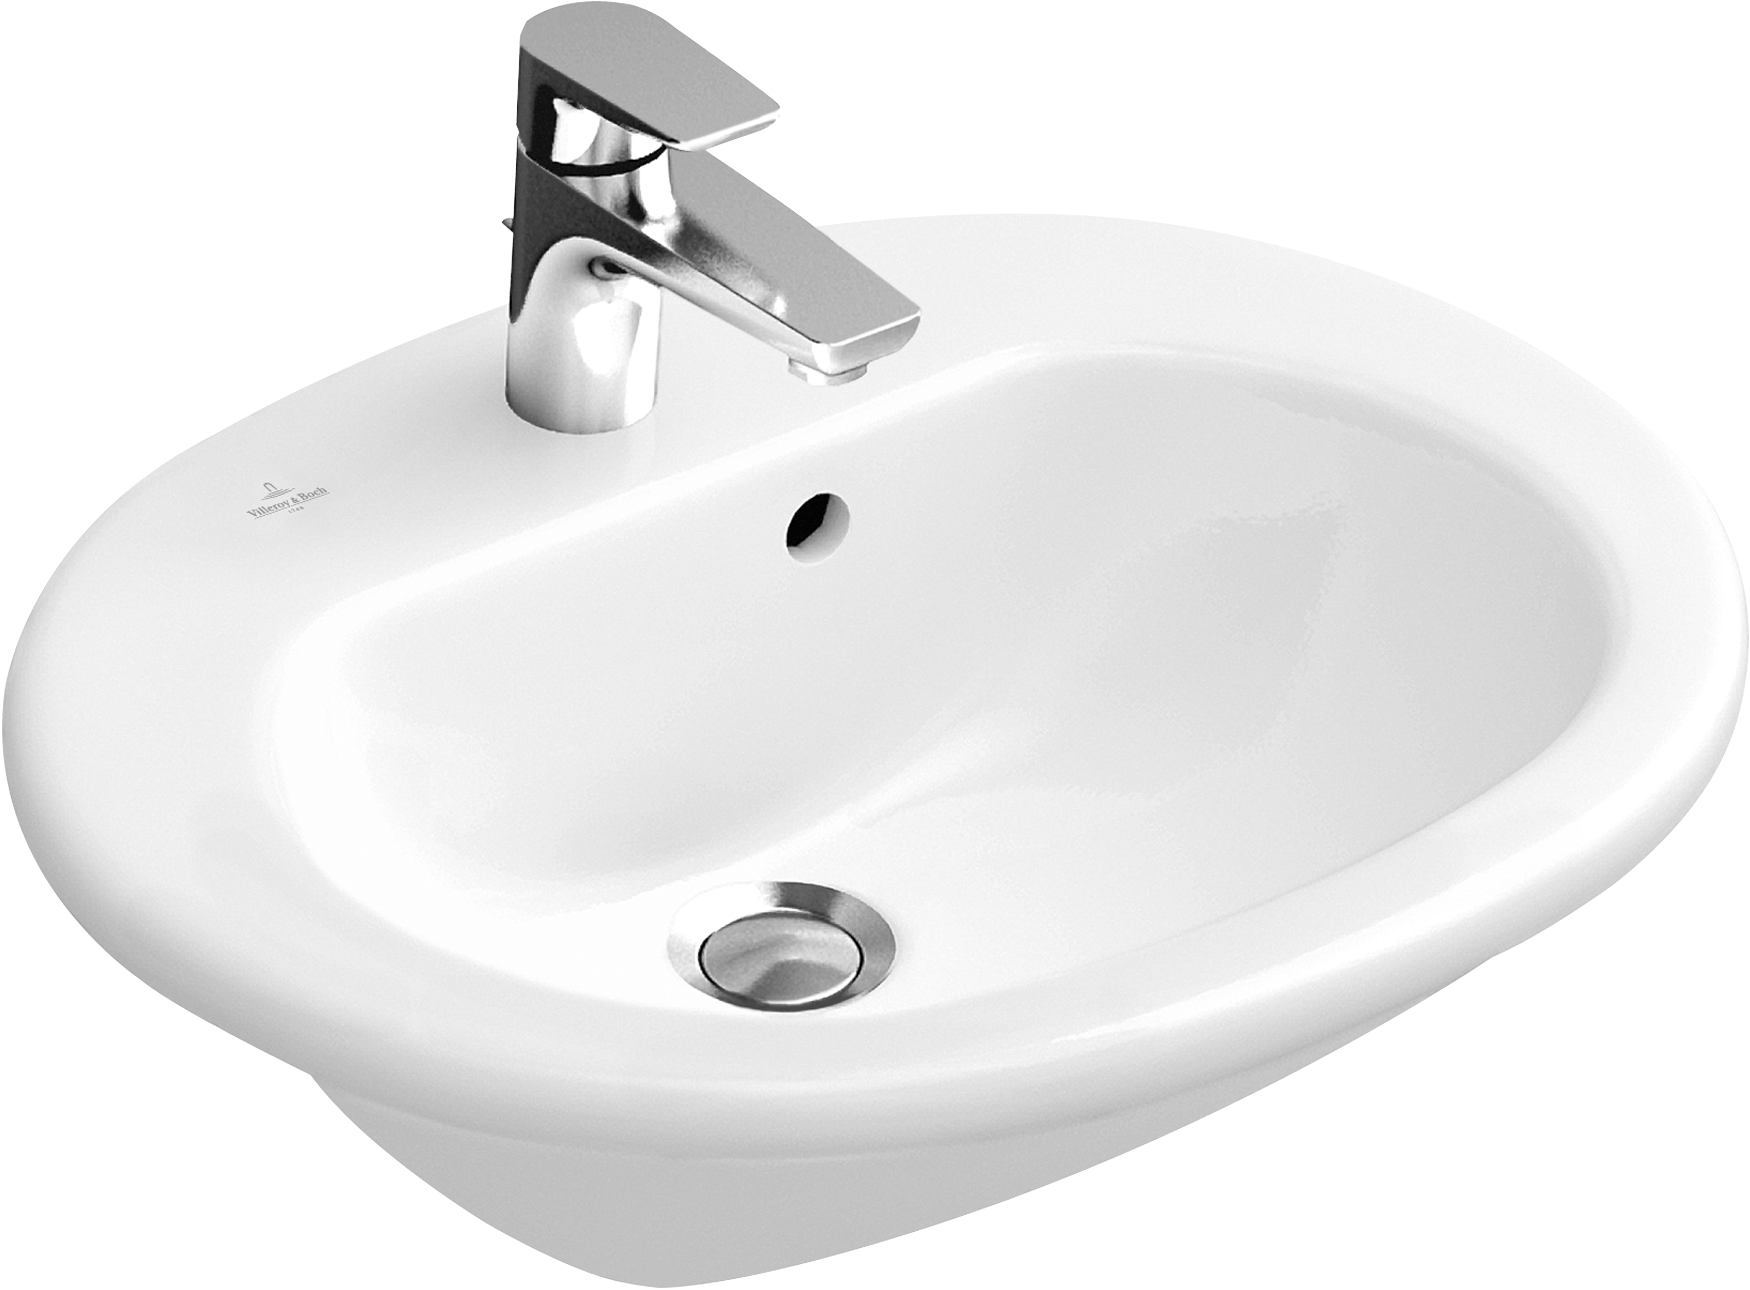 vasque semi encastr e ovale 416055 villeroy boch. Black Bedroom Furniture Sets. Home Design Ideas